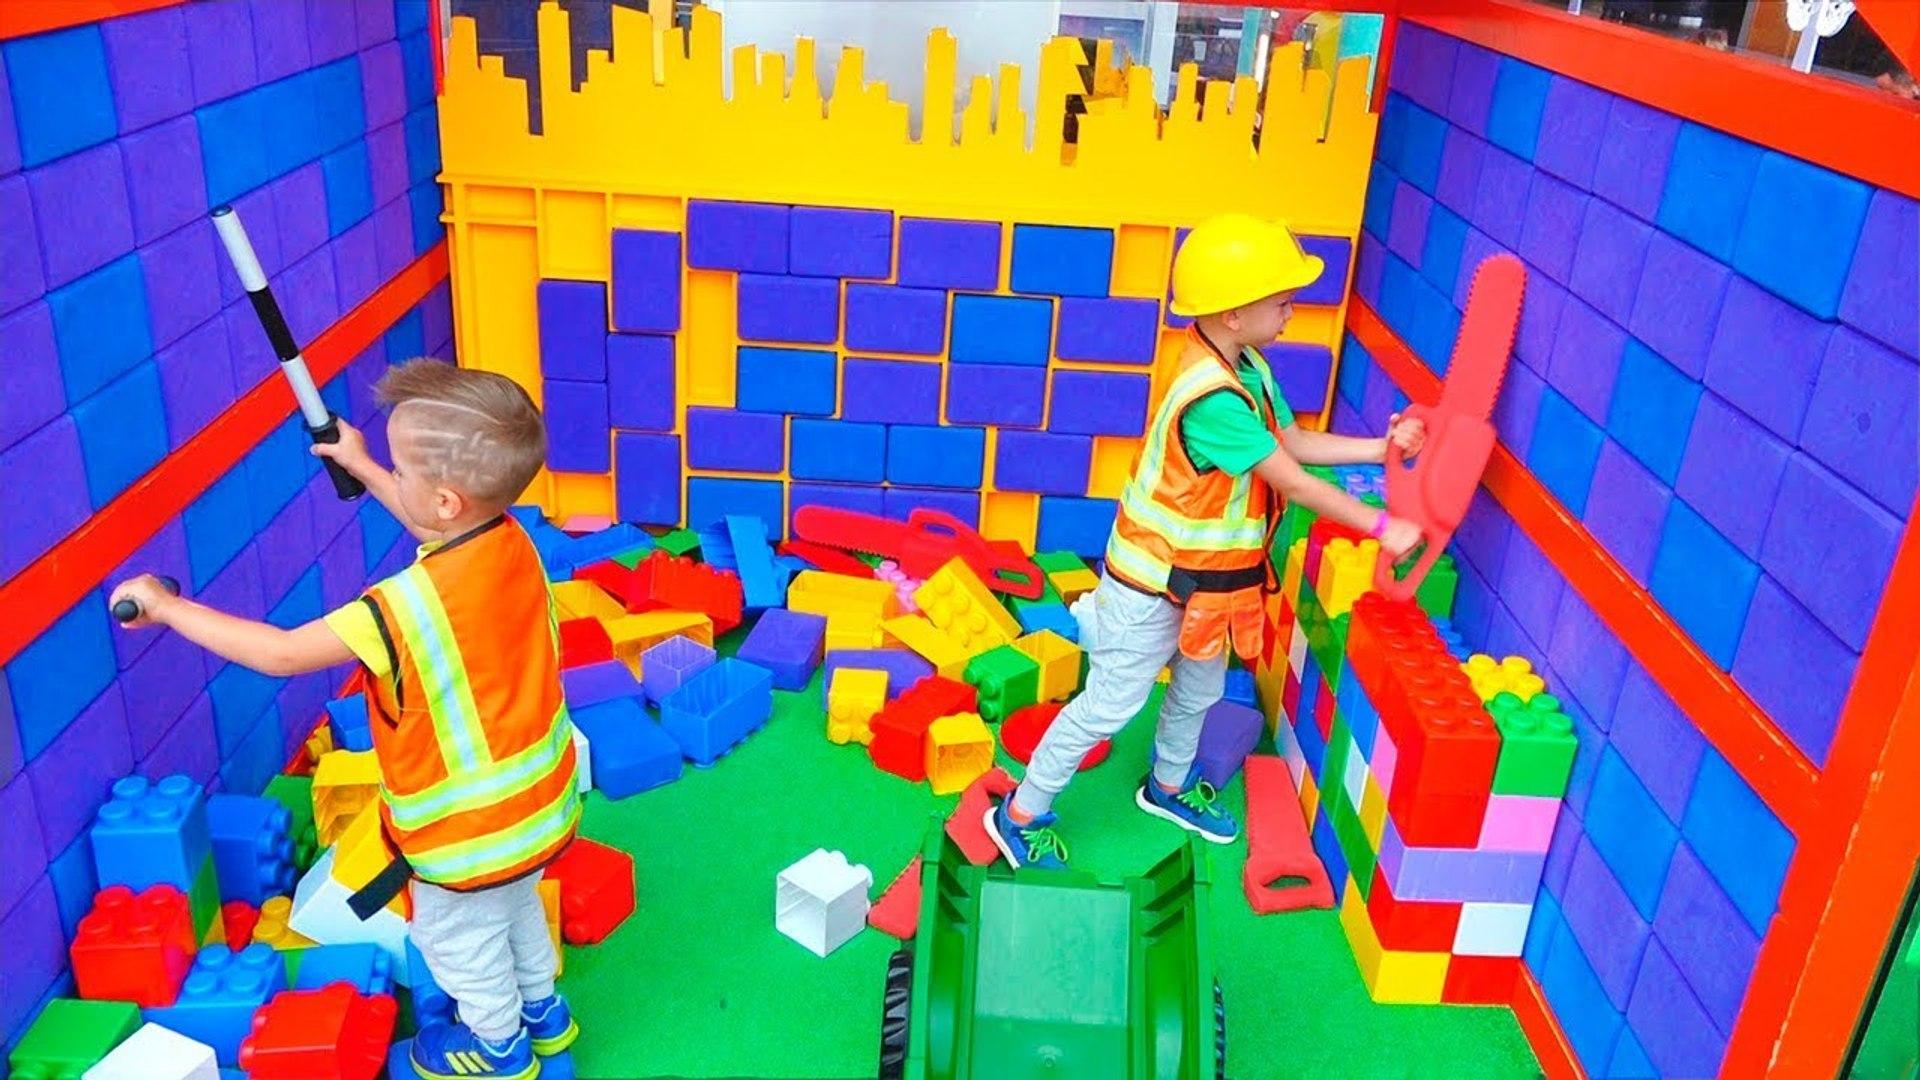 Vlad, Nikita and Mom Kids Activities at Indoor Playground